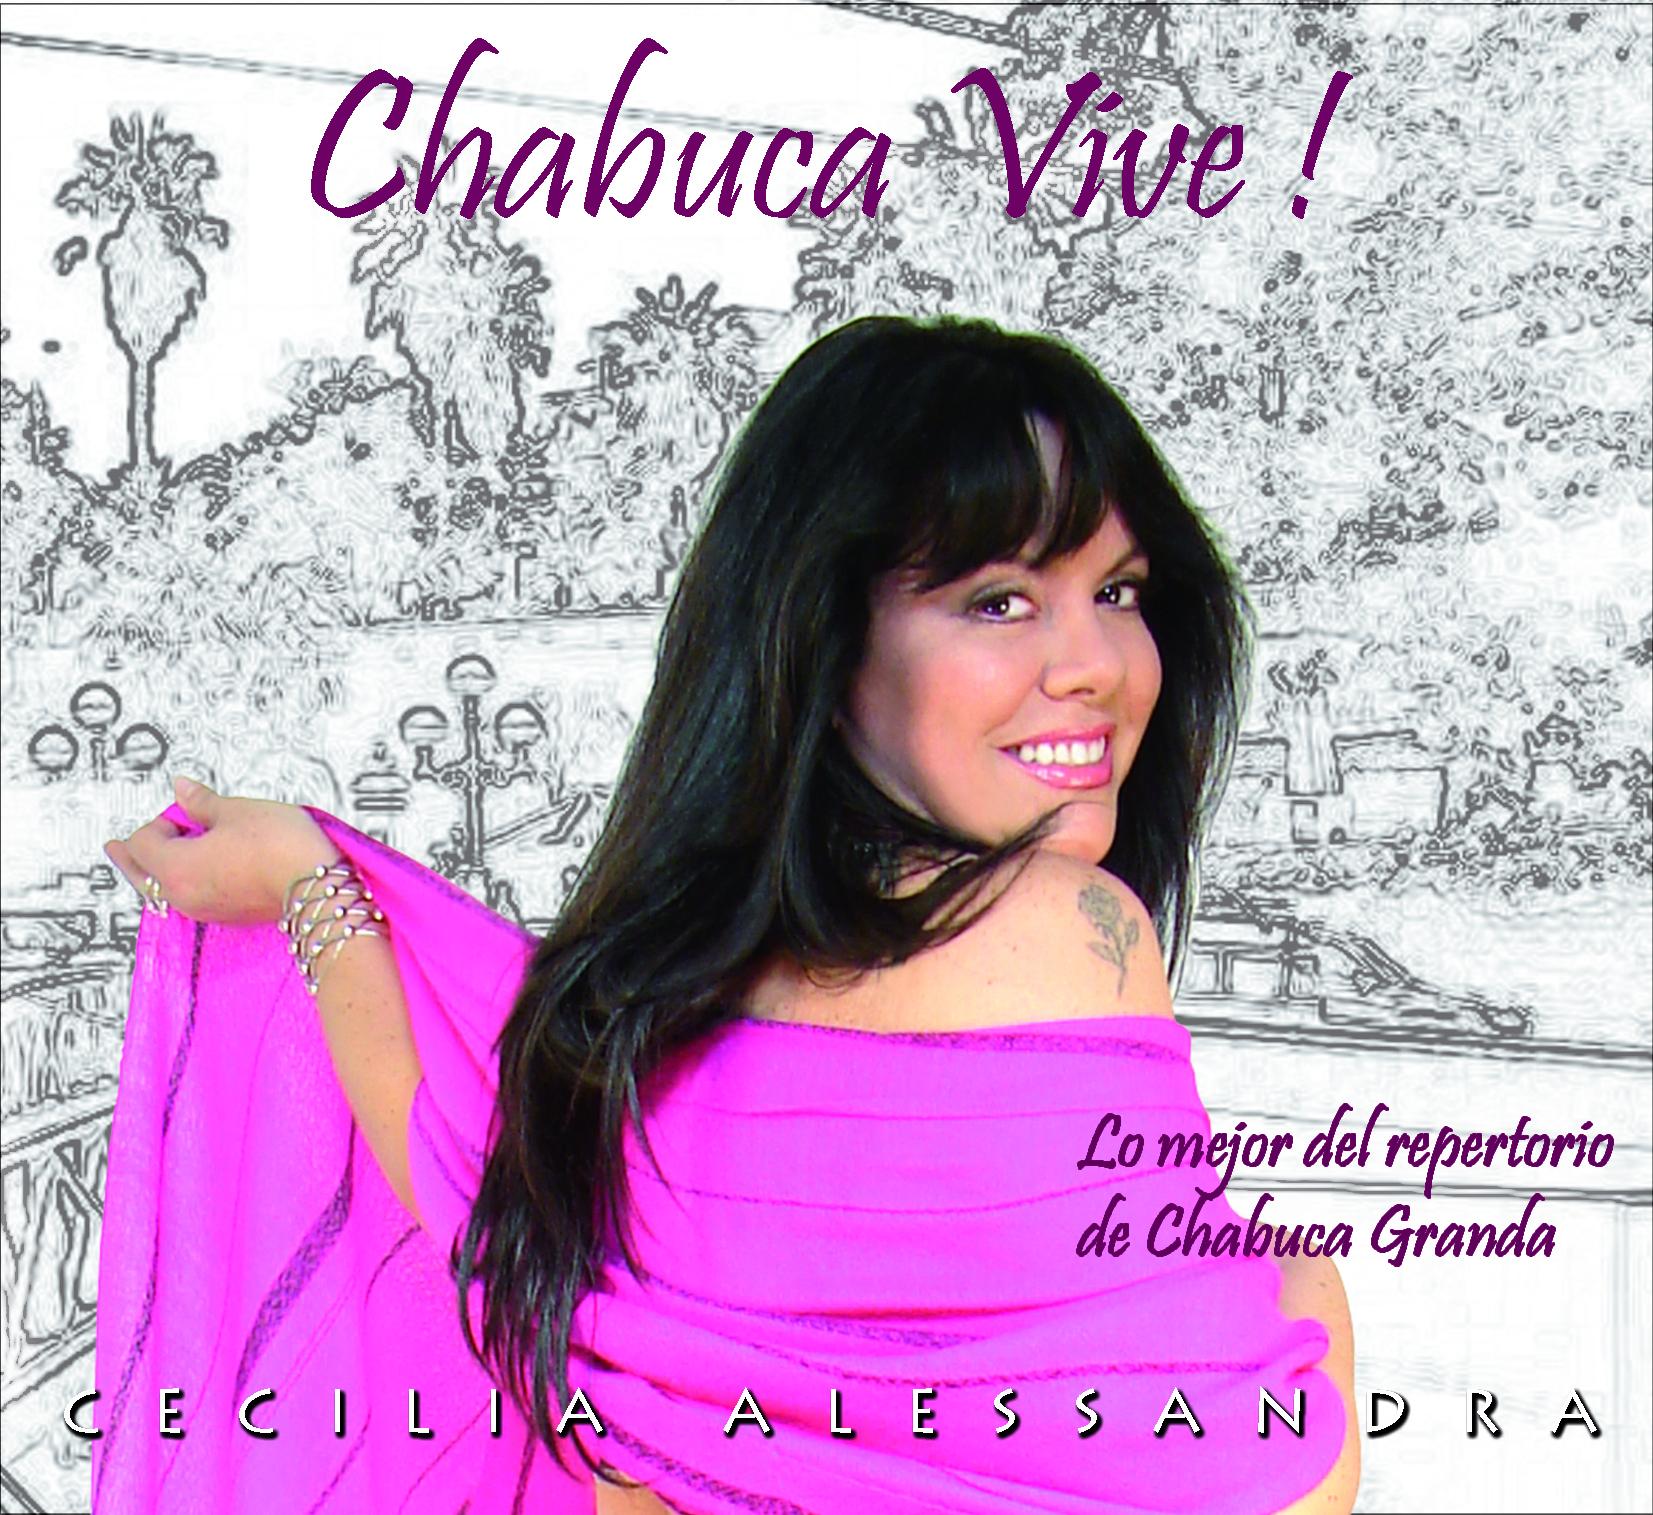 Chabuca Vive